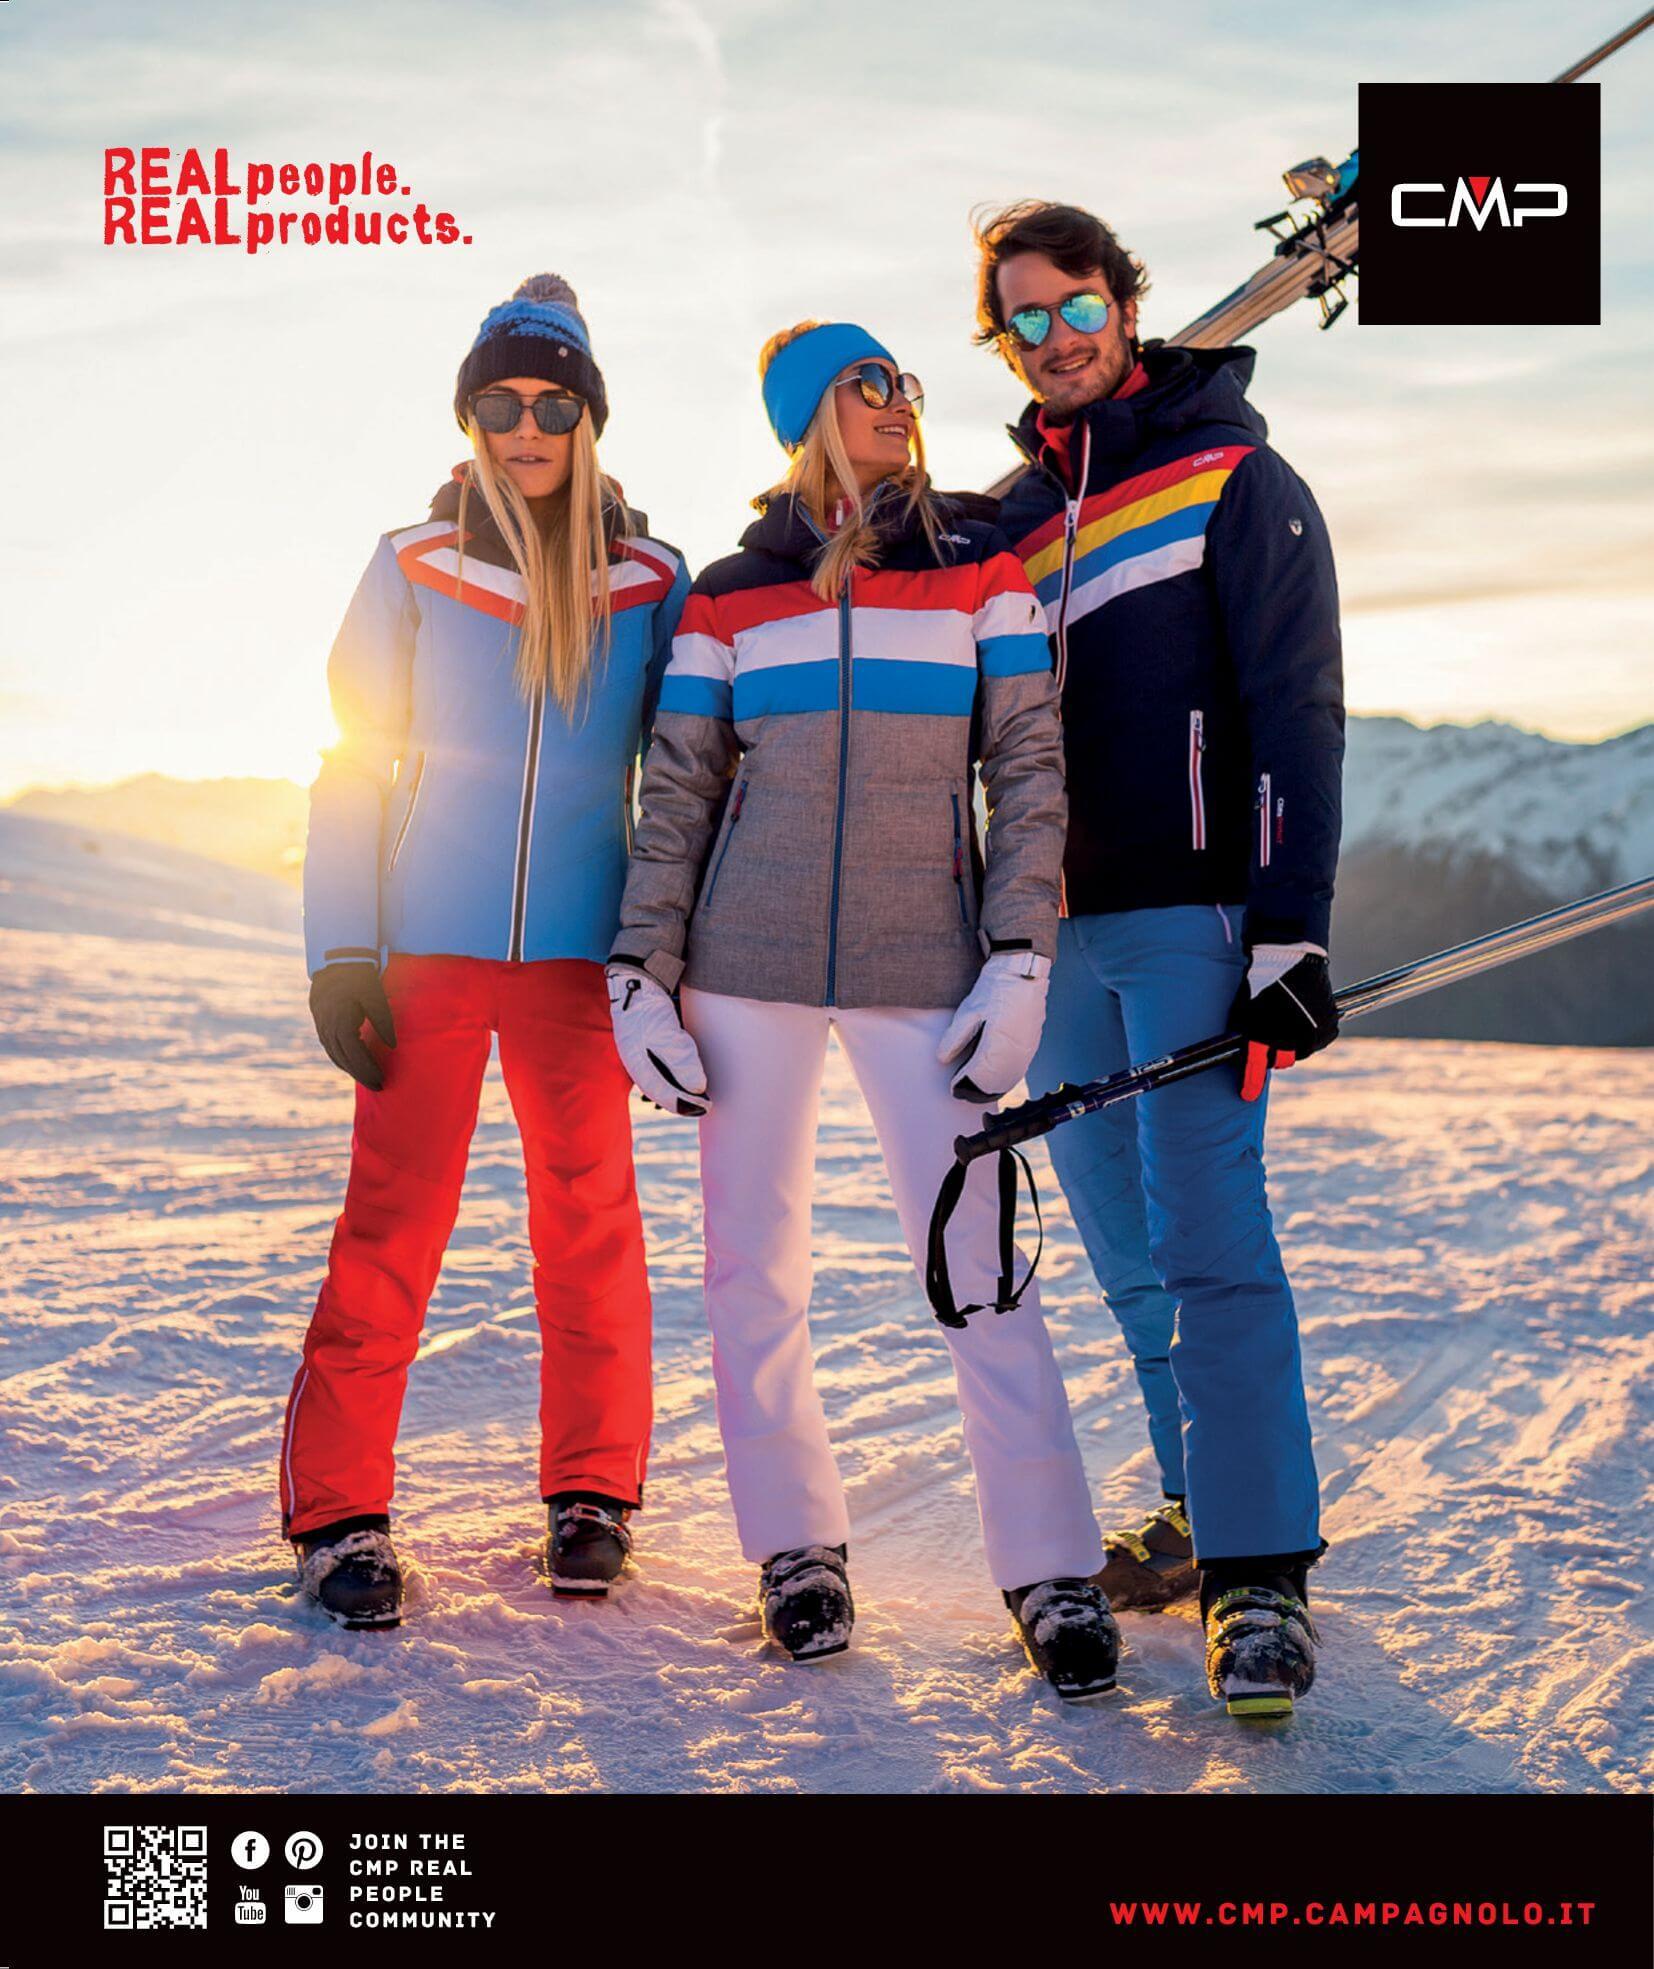 Gazetka Go Sport - Katalog Zima 2017/2018-12.11.2017-28.02.2018-page-91